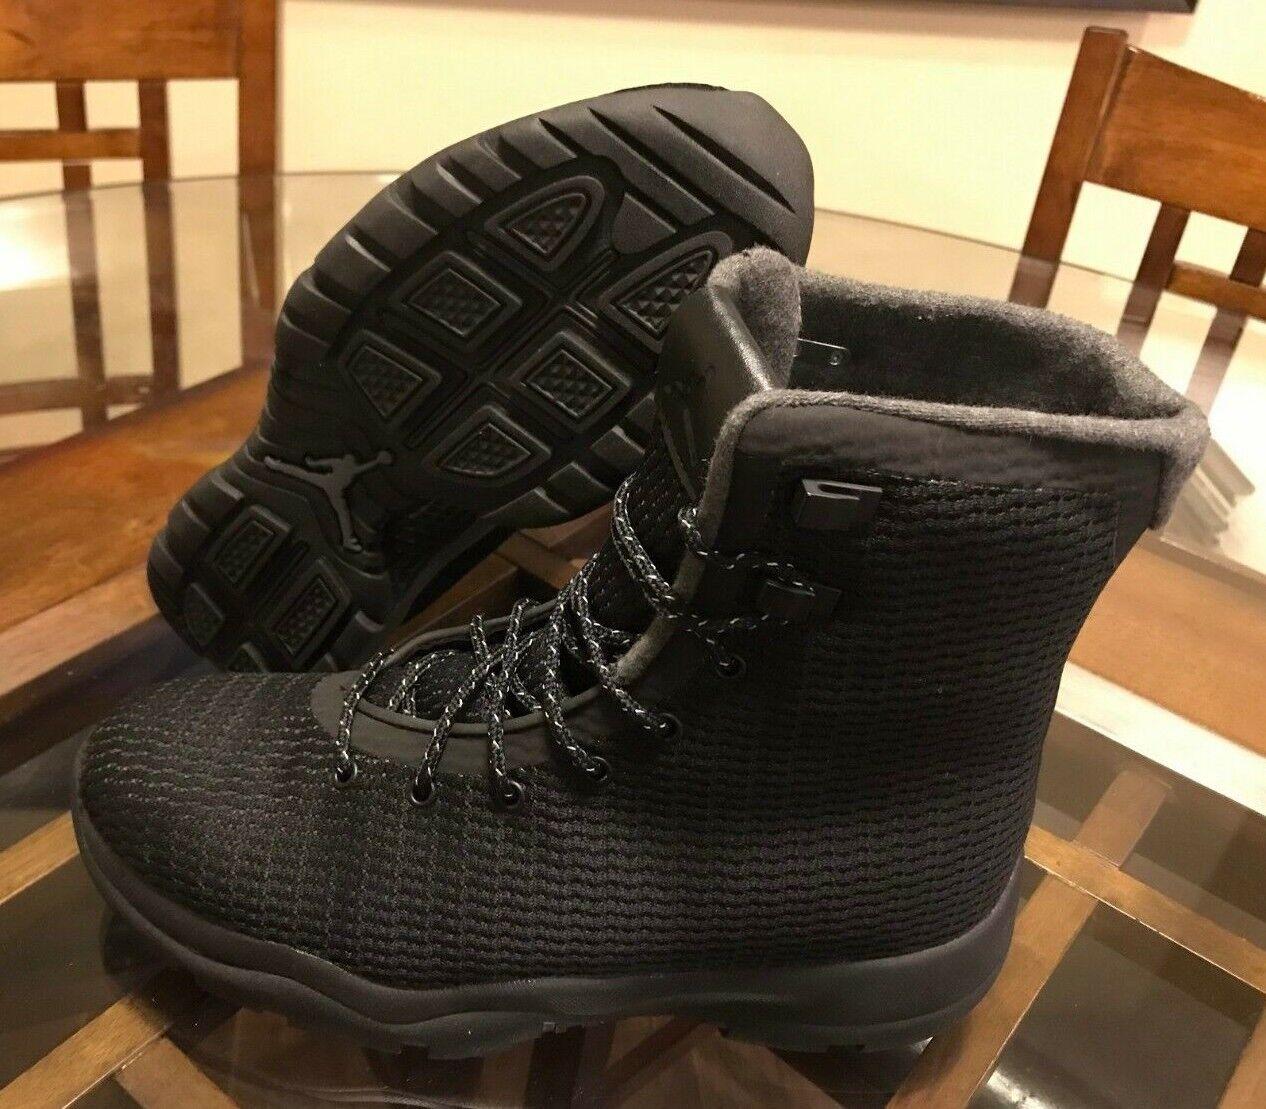 225 Nike Air Jordan Future Boot Black Dark Grey Waterproof 854554-002 Size 8.5